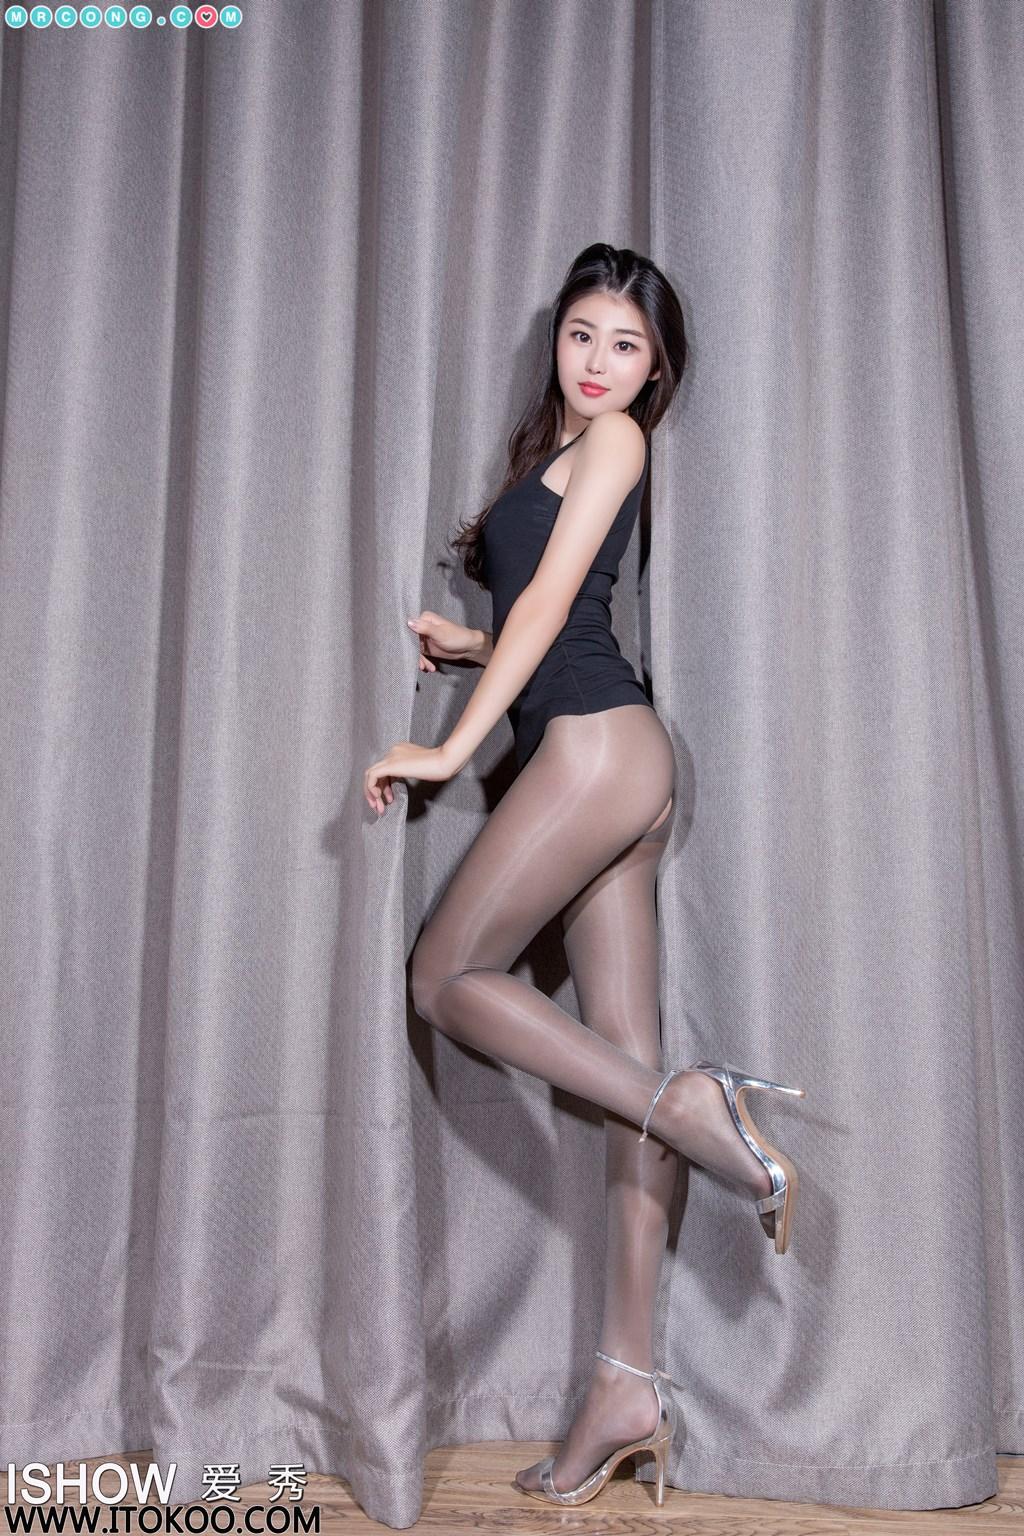 Image ISHOW-No.160-Liu-Yue-Fei-Phoebe-MrCong.com-008 in post ISHOW No.160: Người mẫu Liu Yue Fei (刘玥菲Phoebe) (31 ảnh)